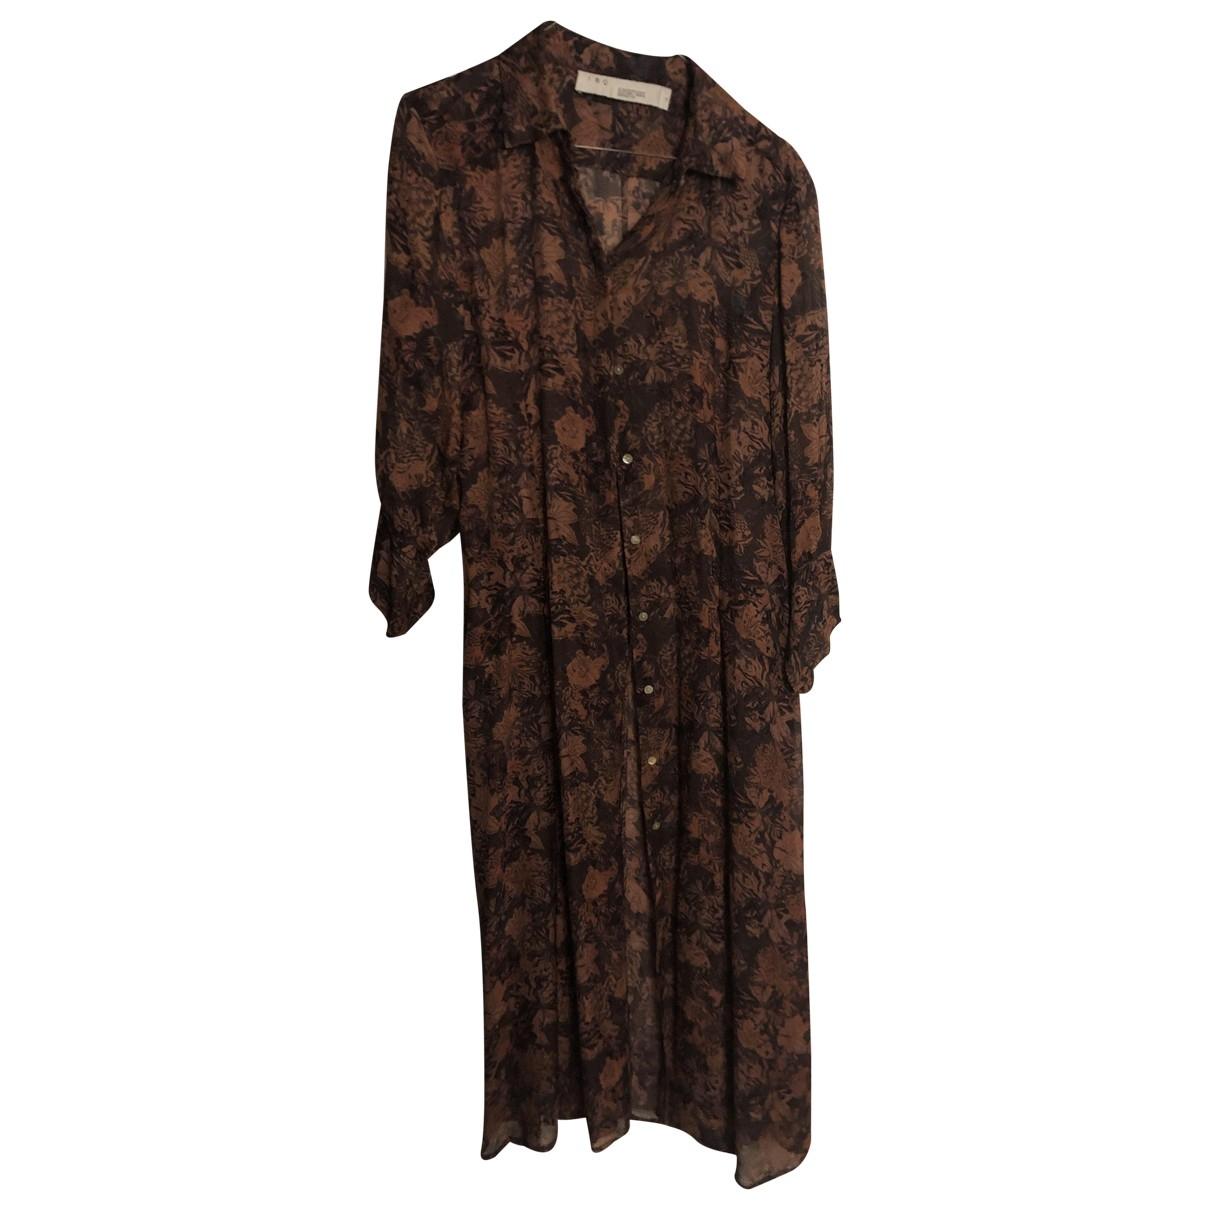 Iro Spring Summer 2019 Brown dress for Women 38 FR